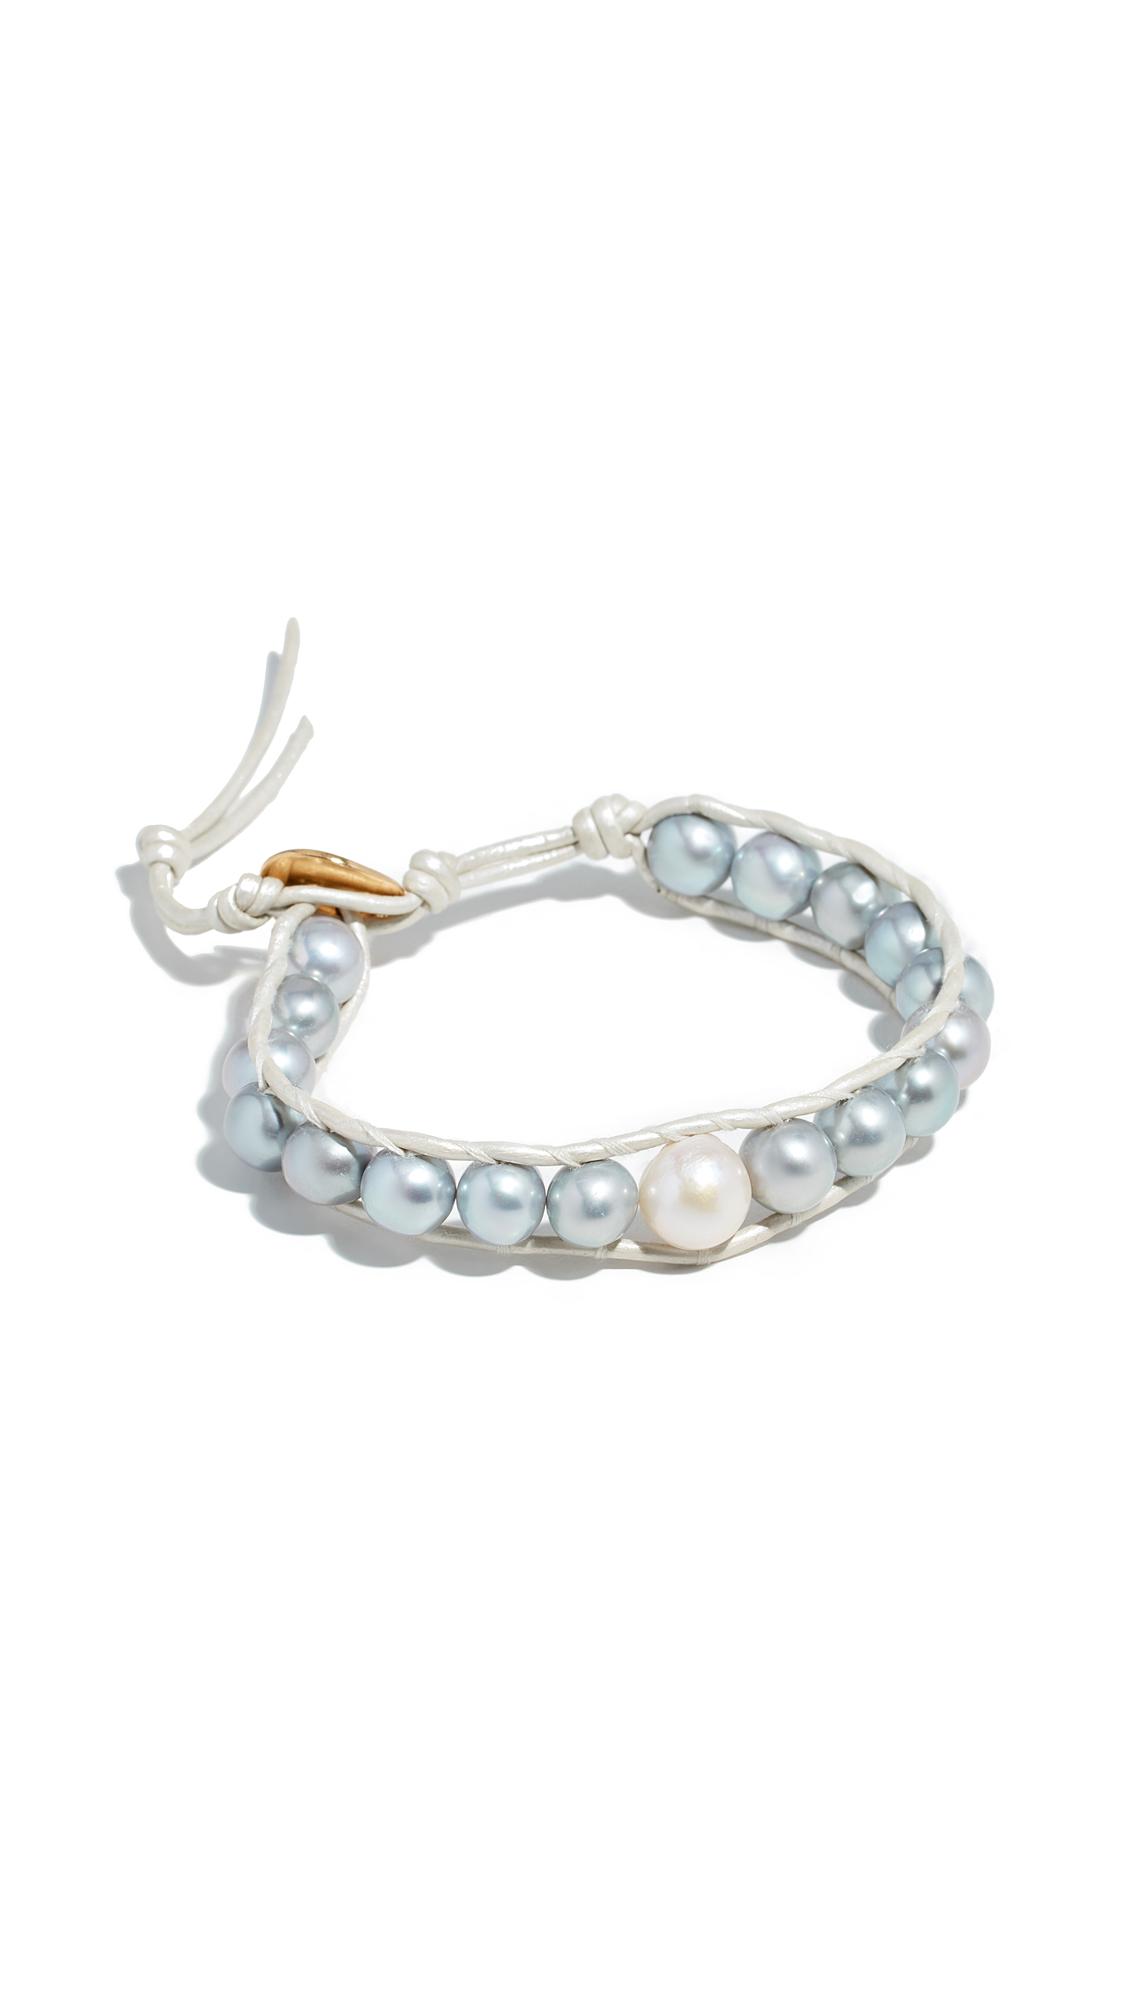 CHAN LUU Cultured Pearl Leather Bracelet in Grey/Pearl